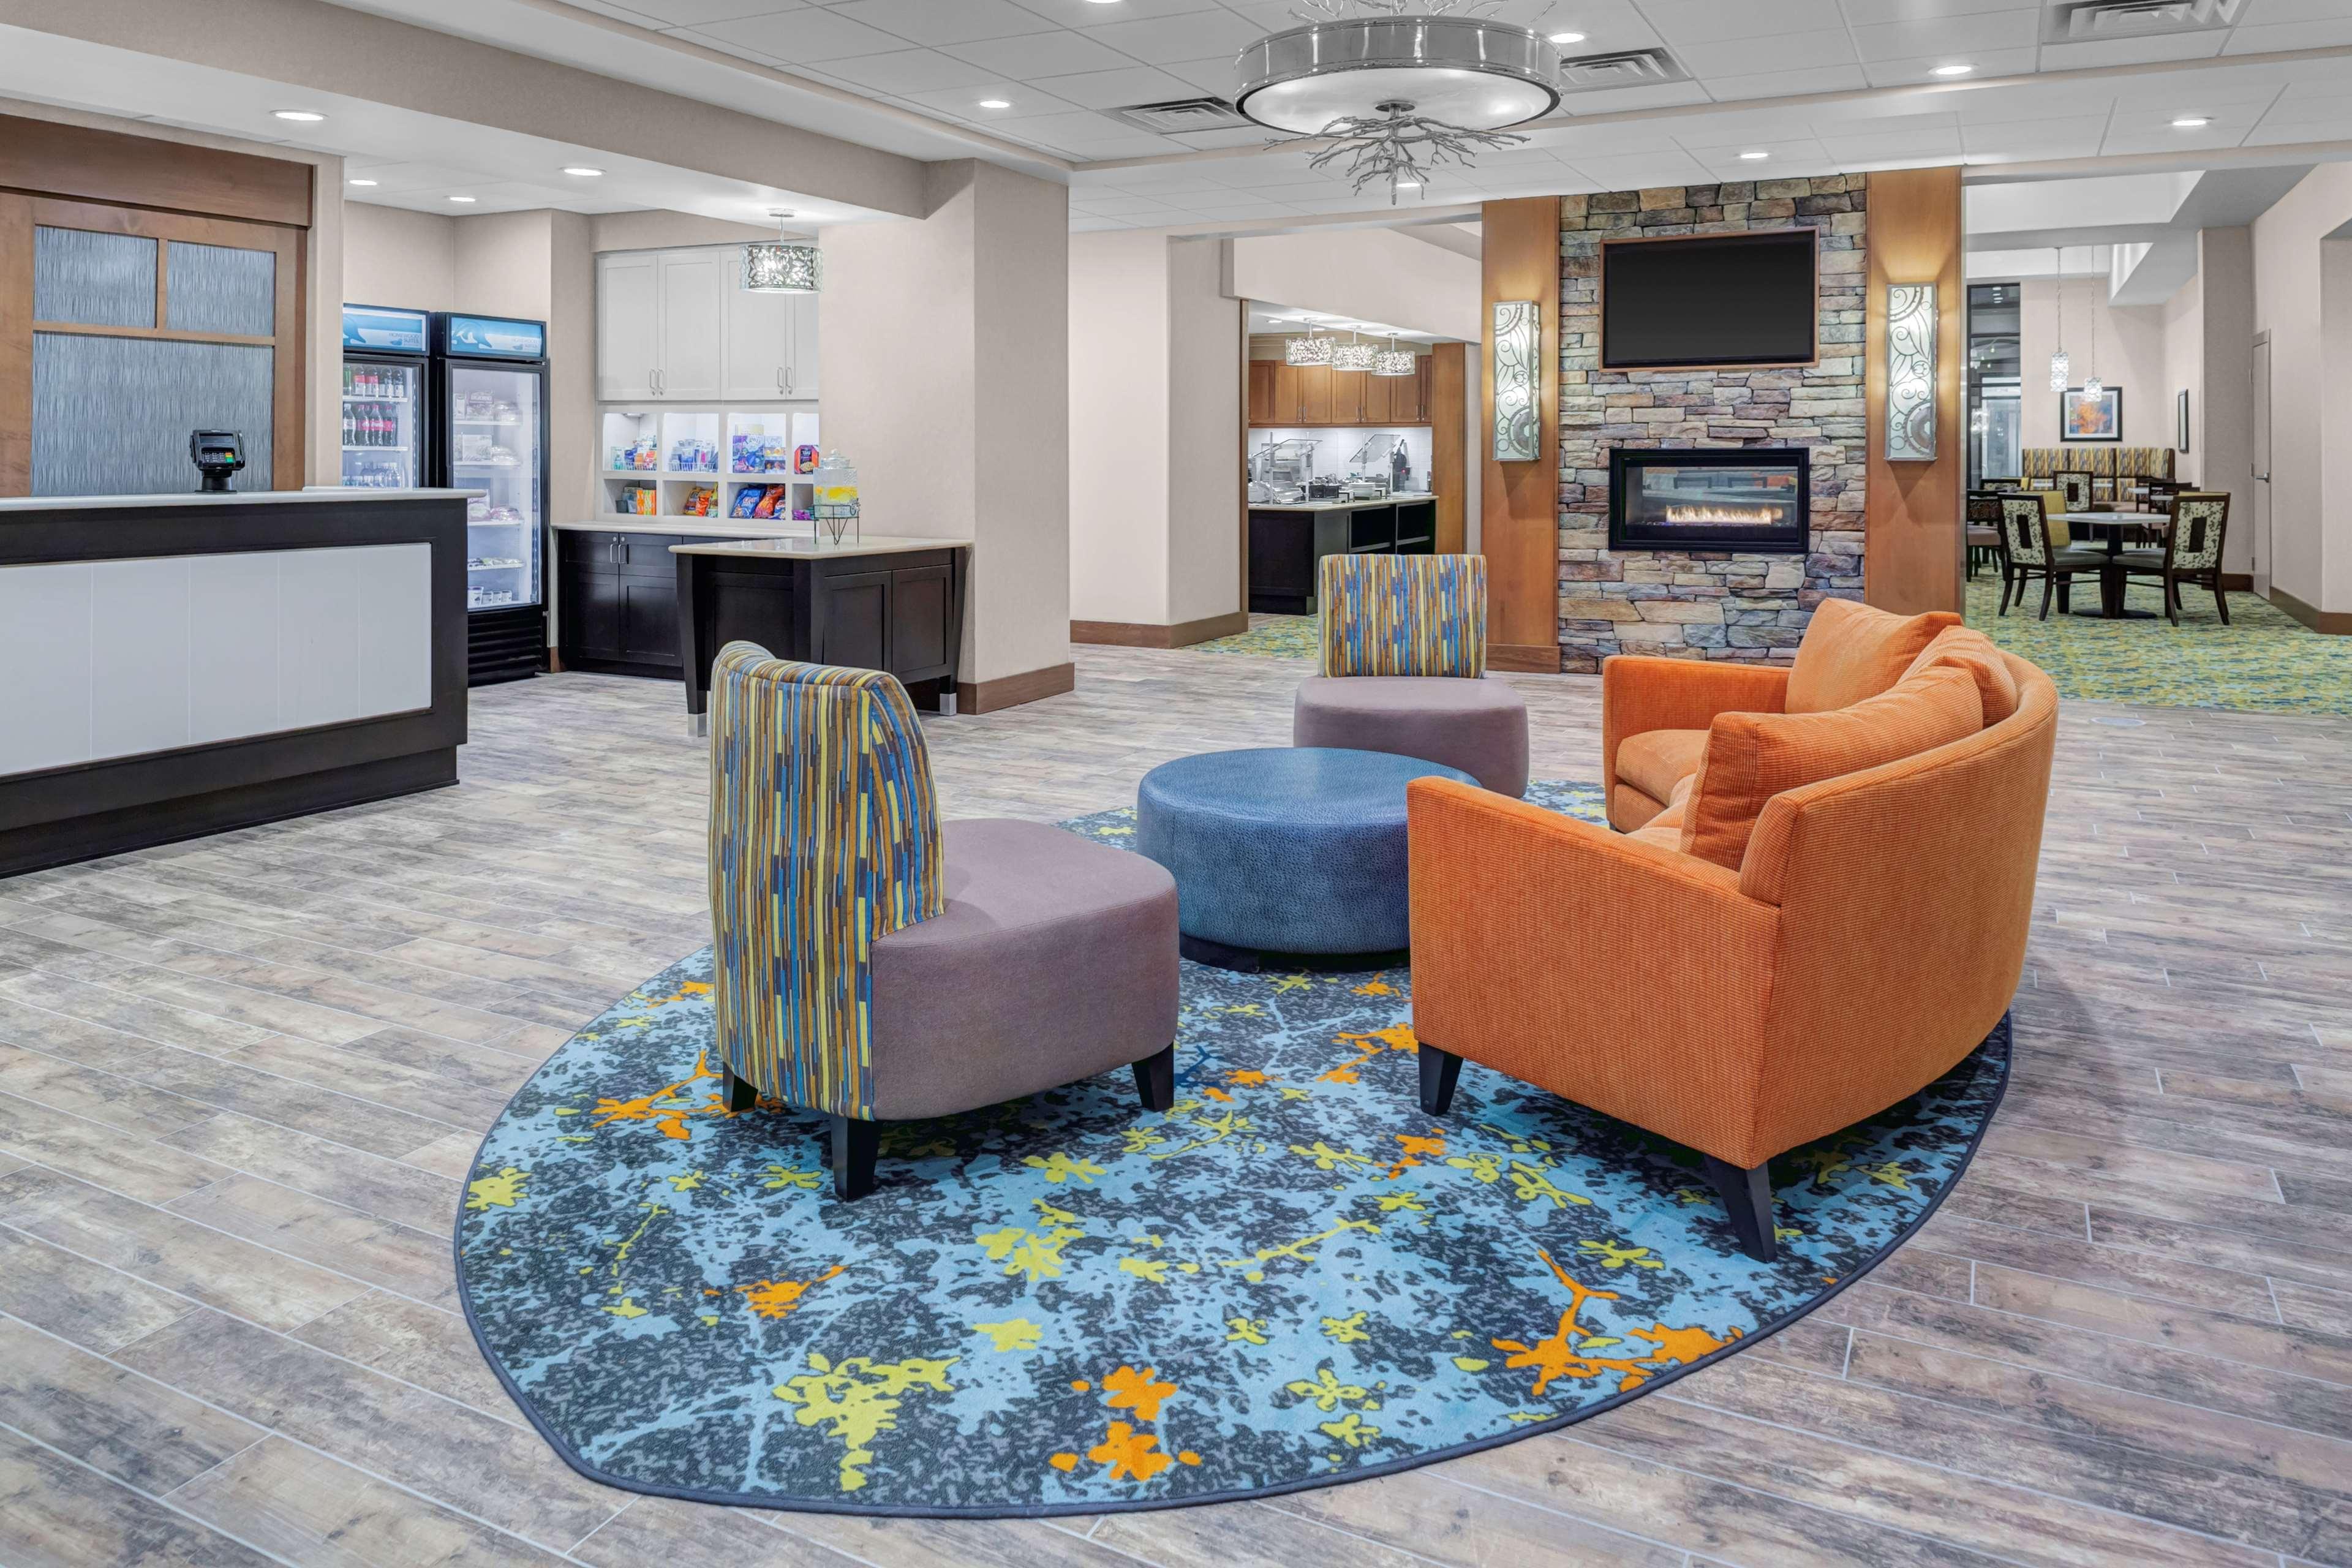 Homewood Suites by Hilton Wauwatosa Milwaukee image 0